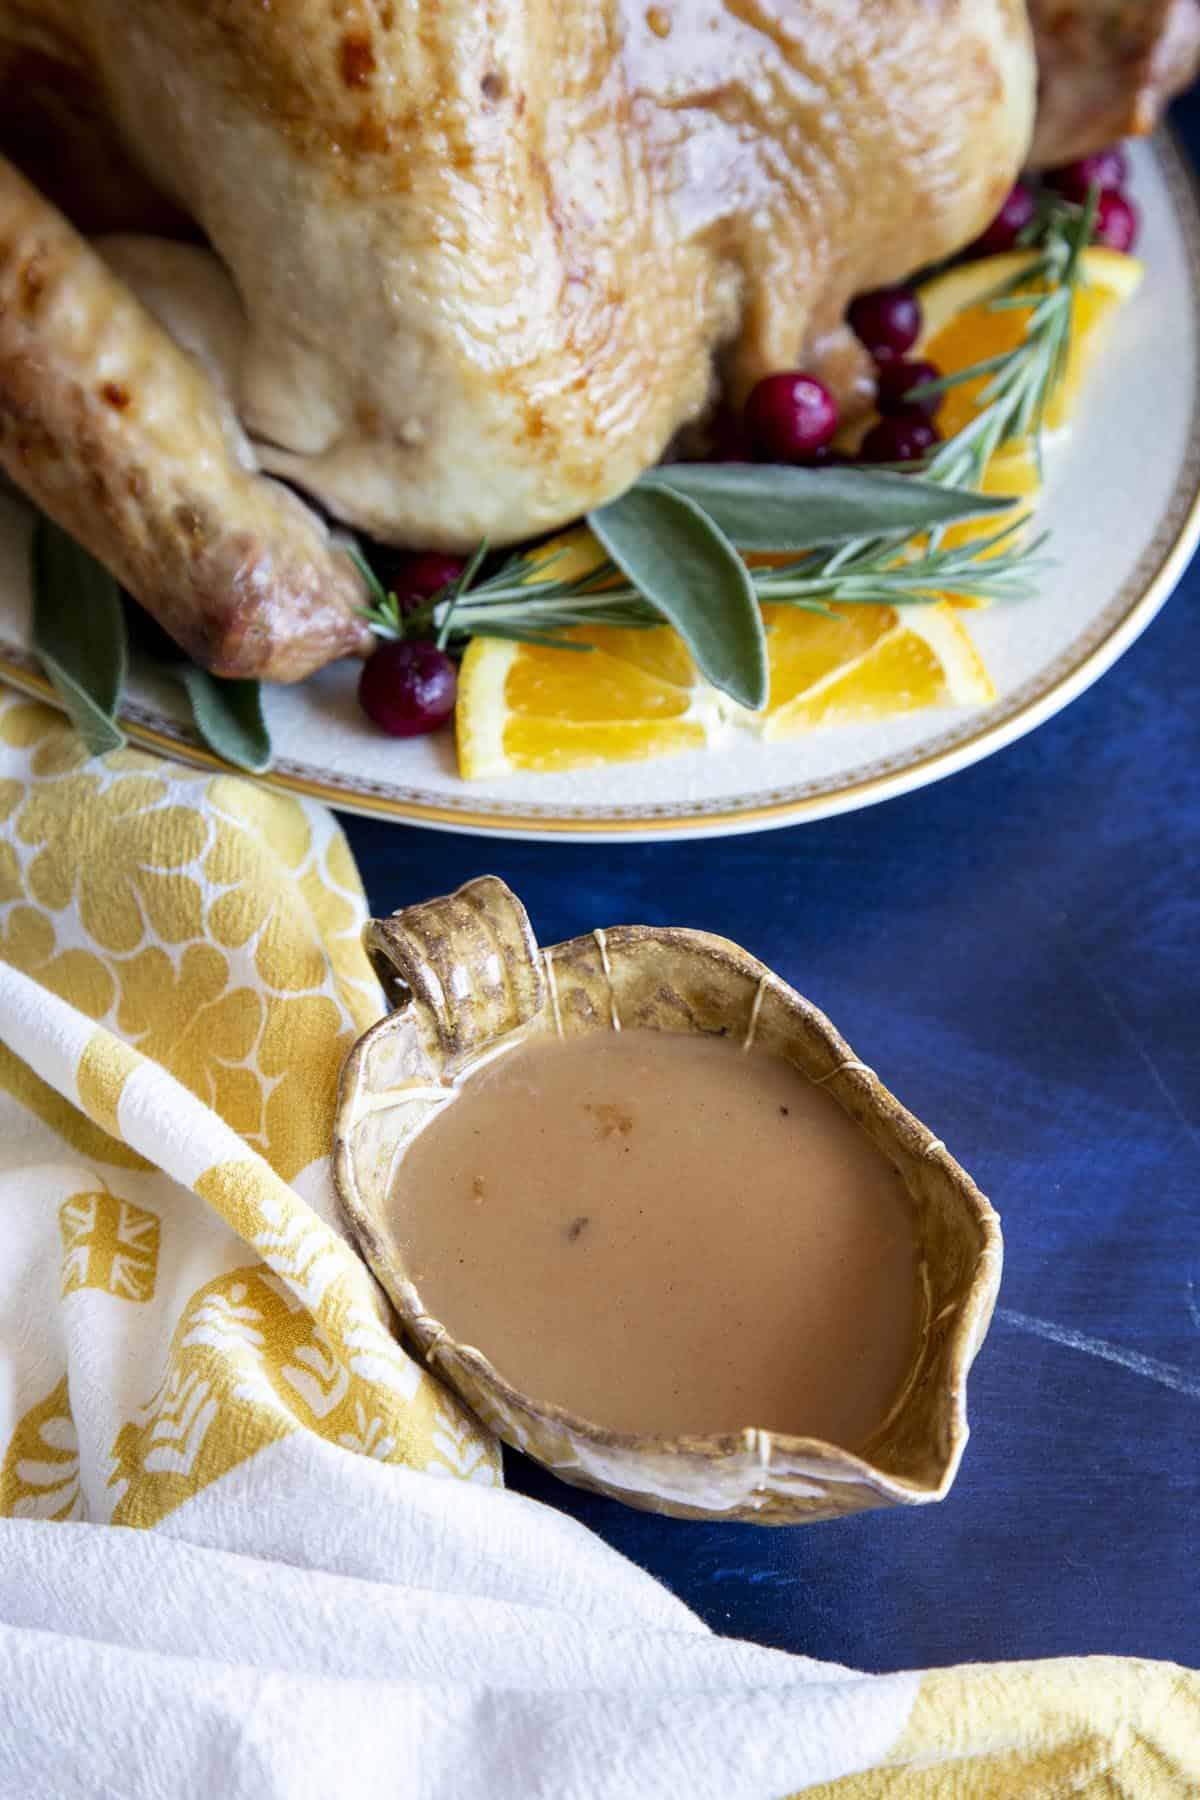 Turkey gravy in a small brown gravy boat